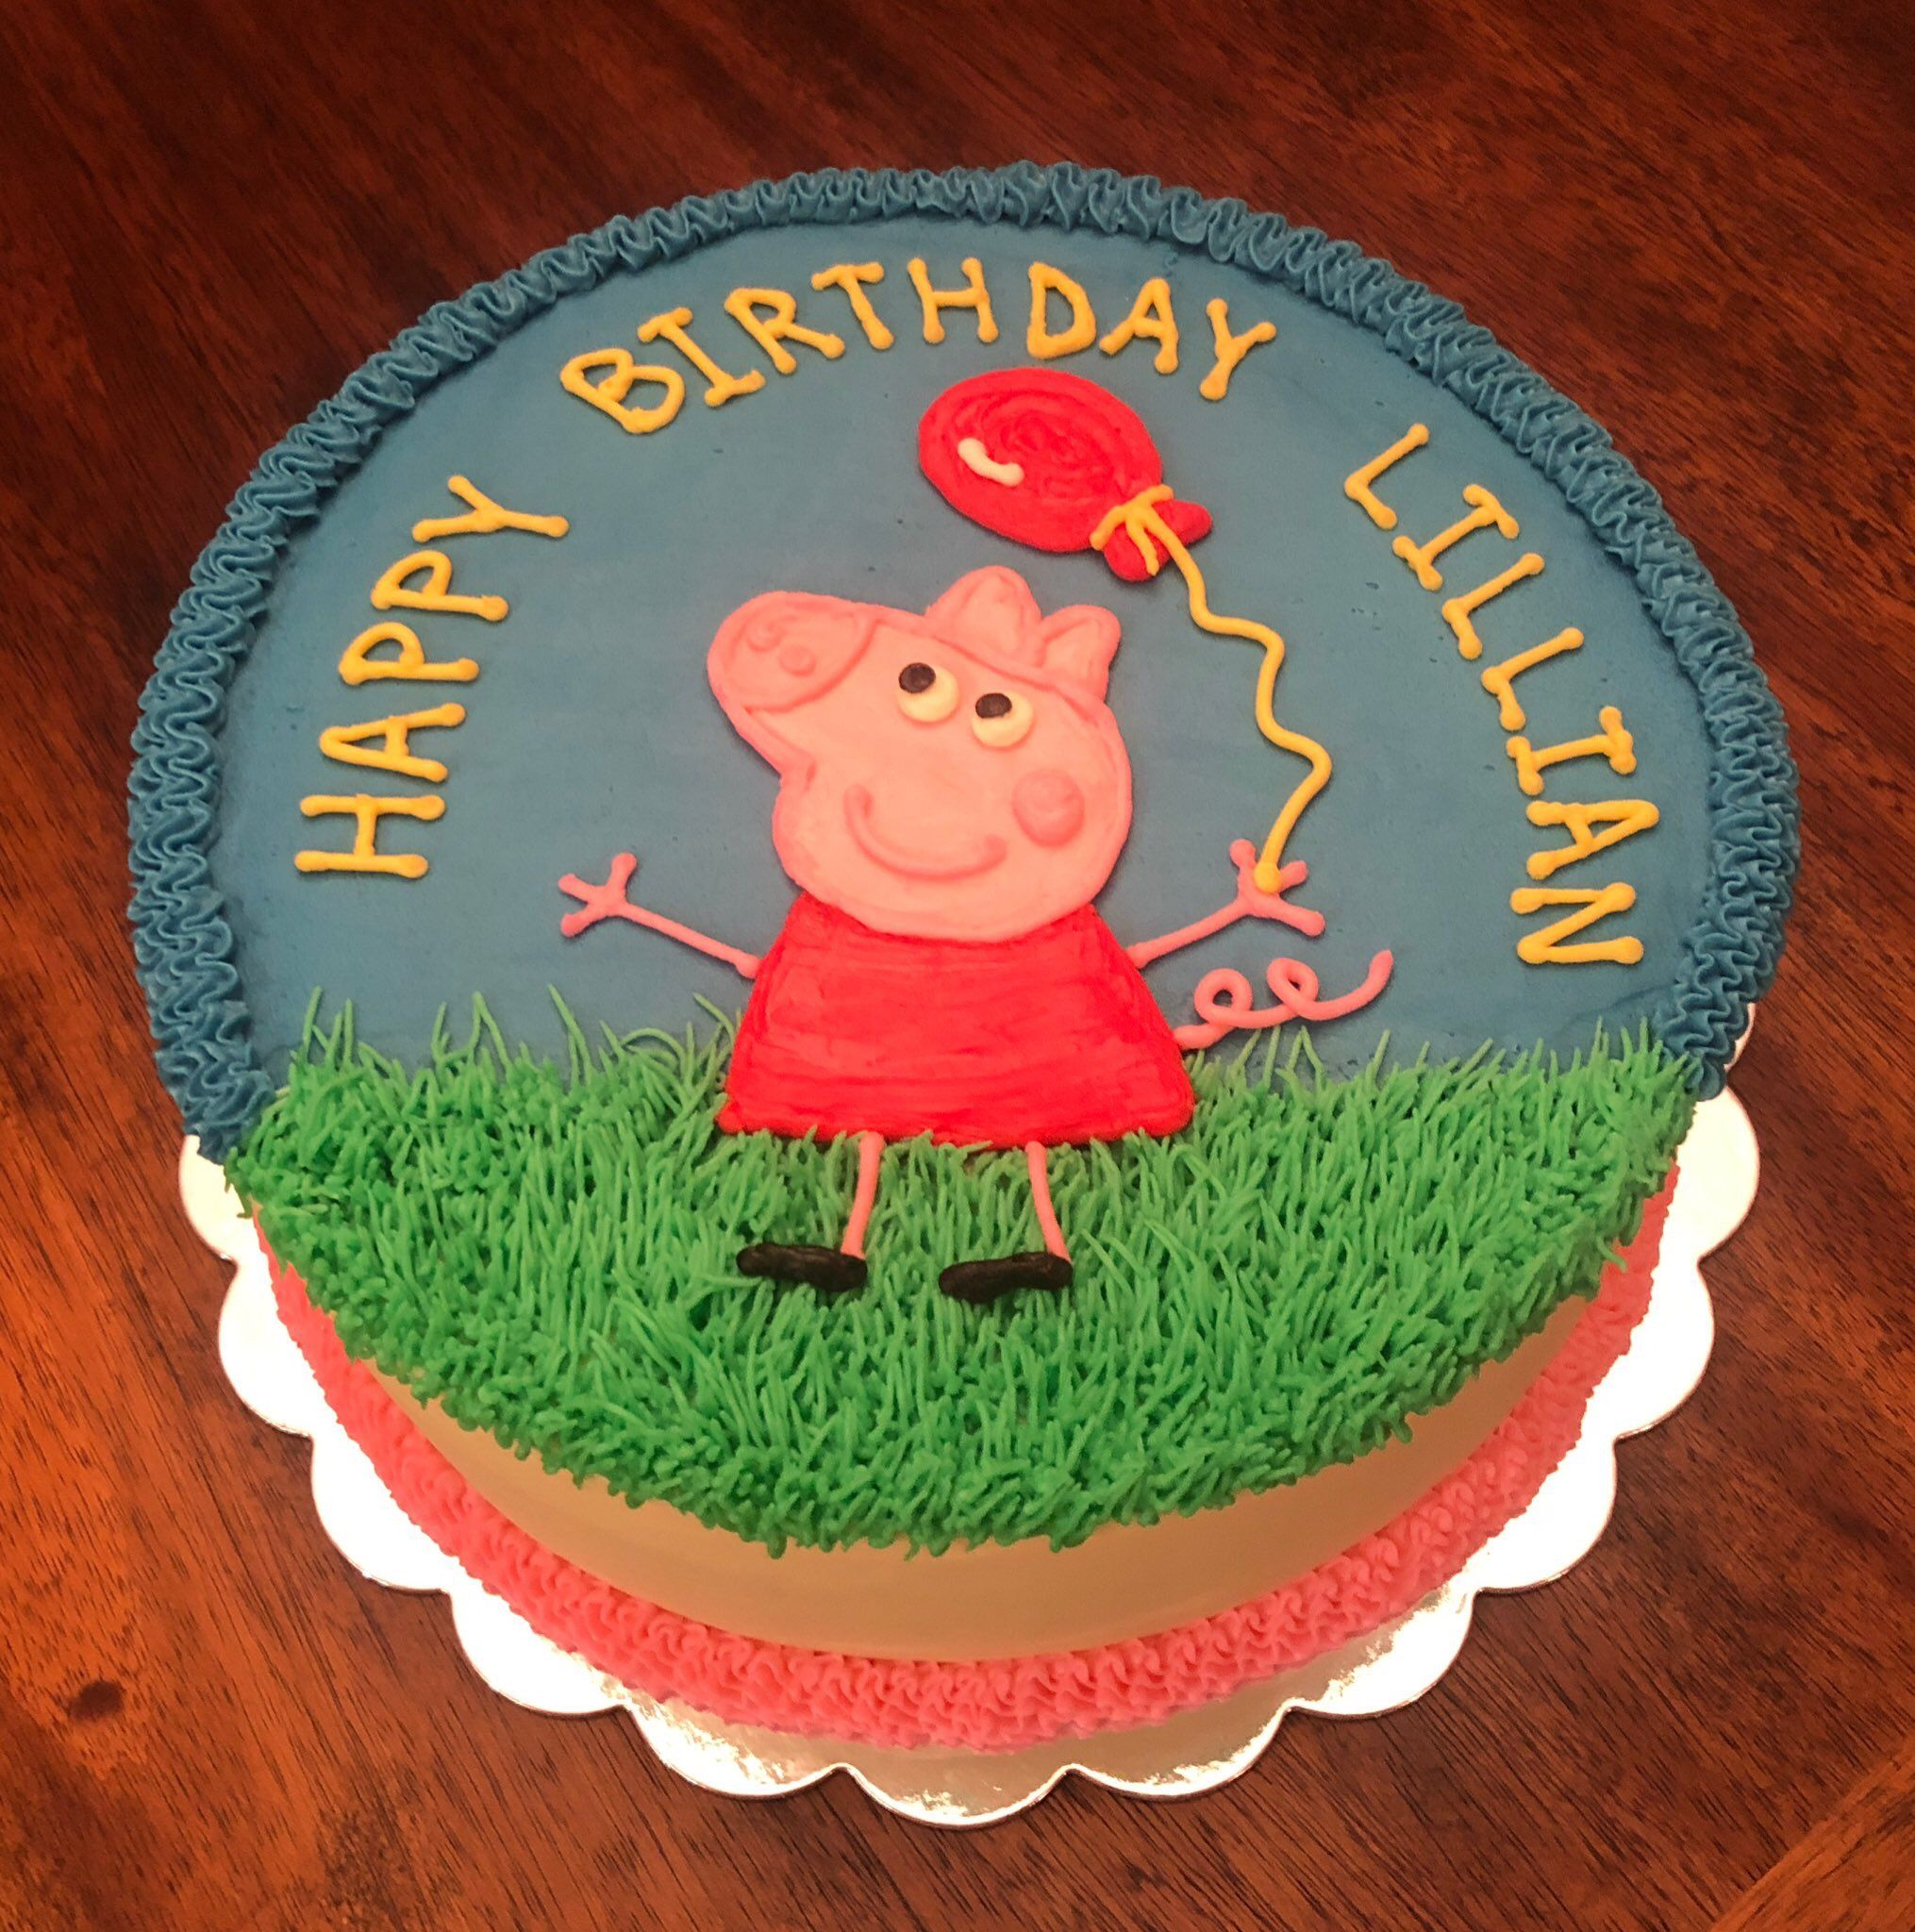 Peppa Pig Cake Easy Diy With Images Pig Birthday Cakes Peppa